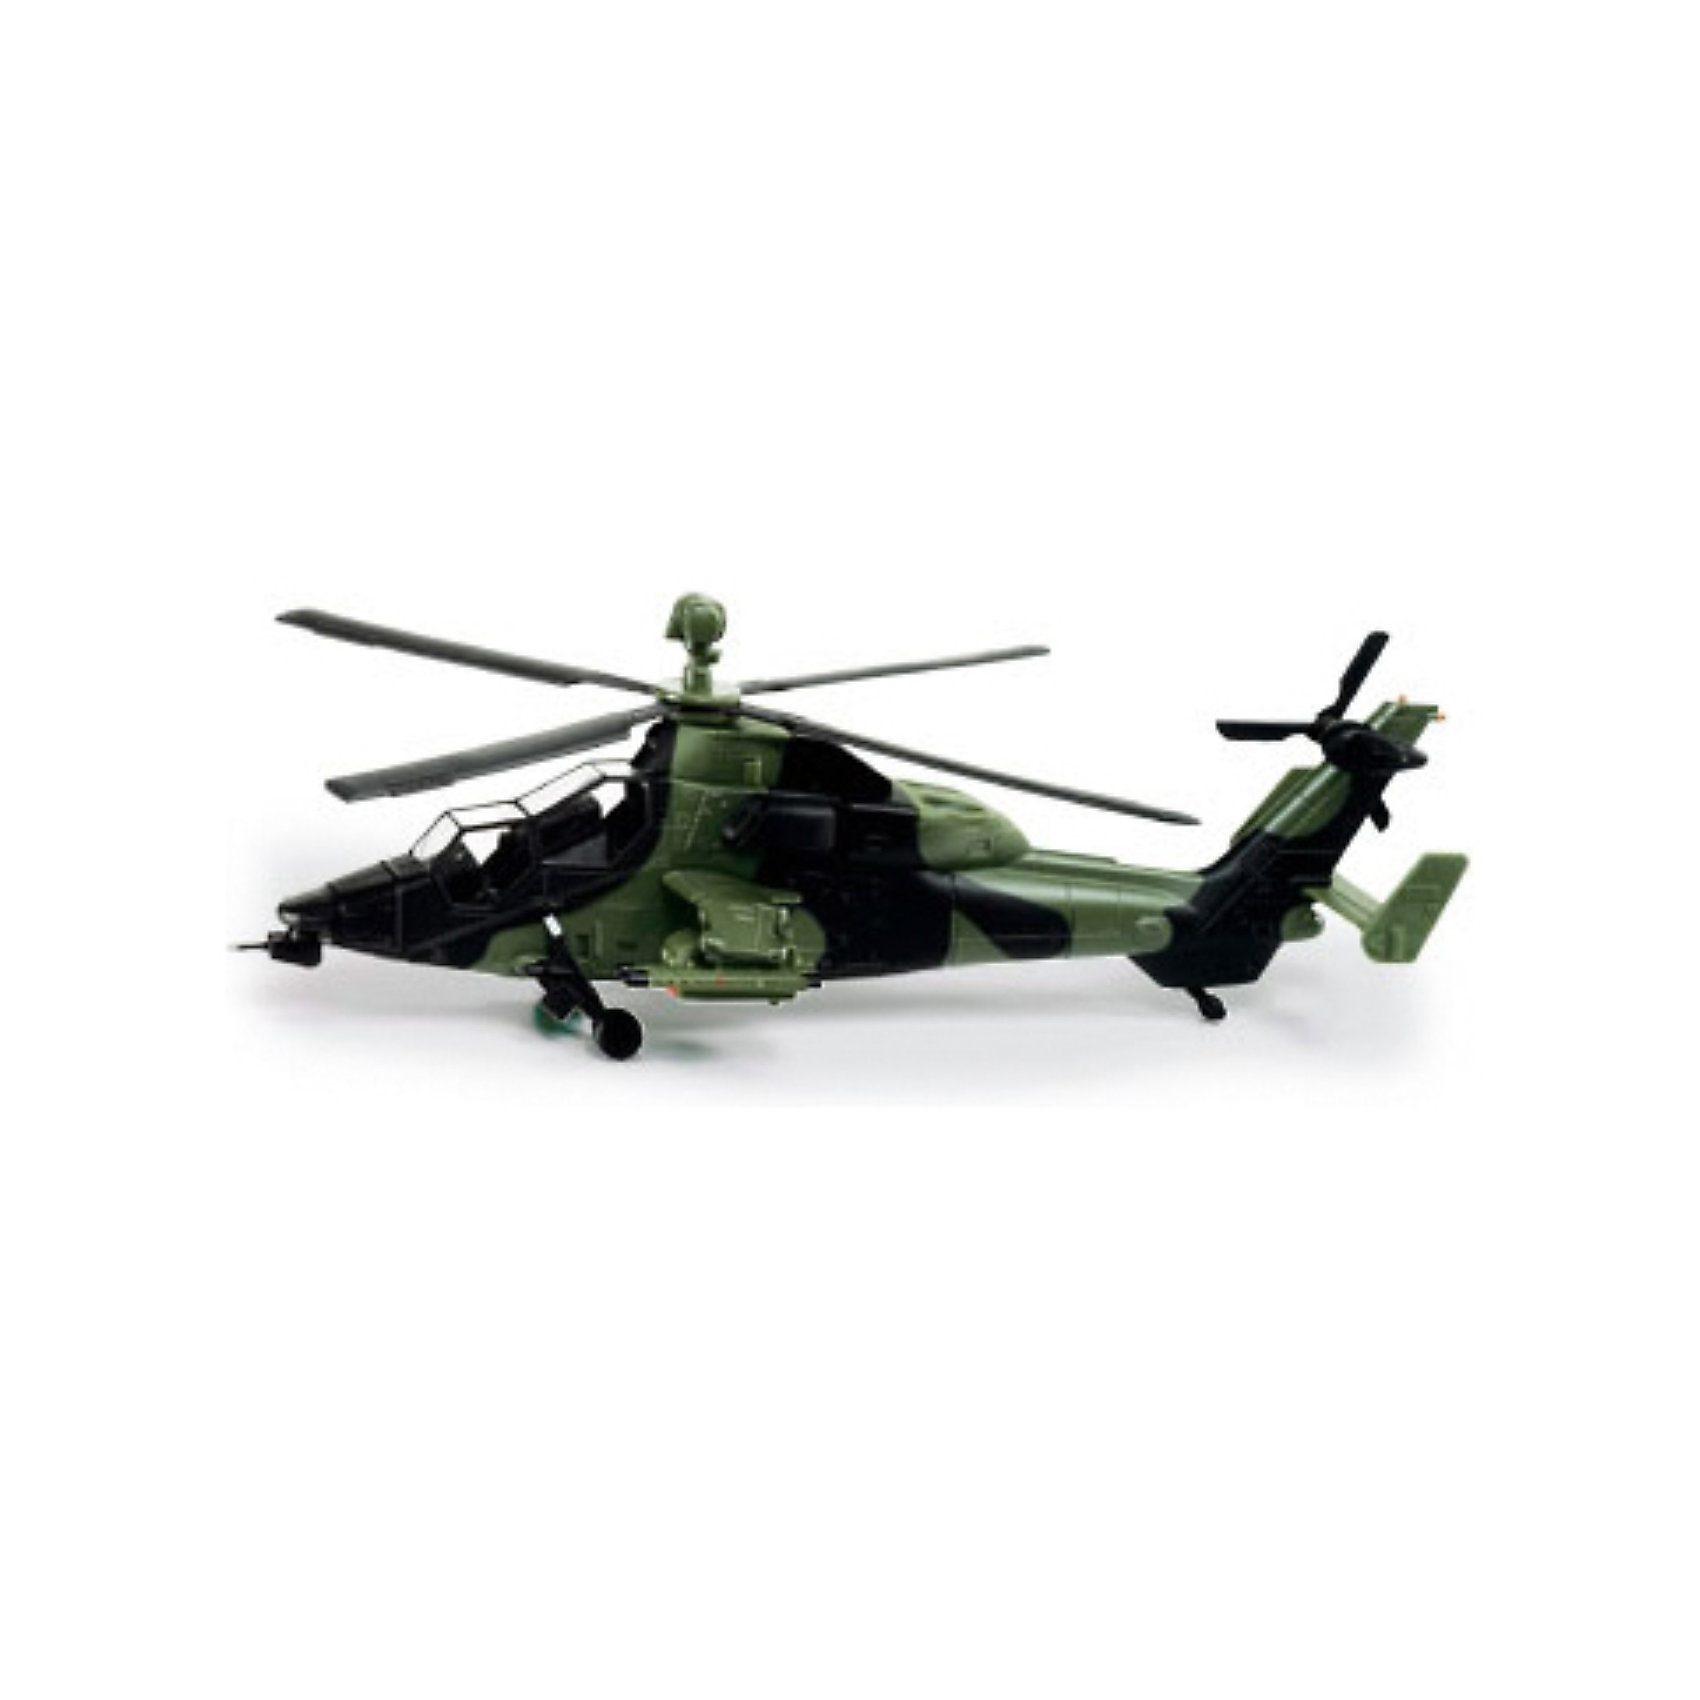 SIKU 4912 Hubschrauber 1:50